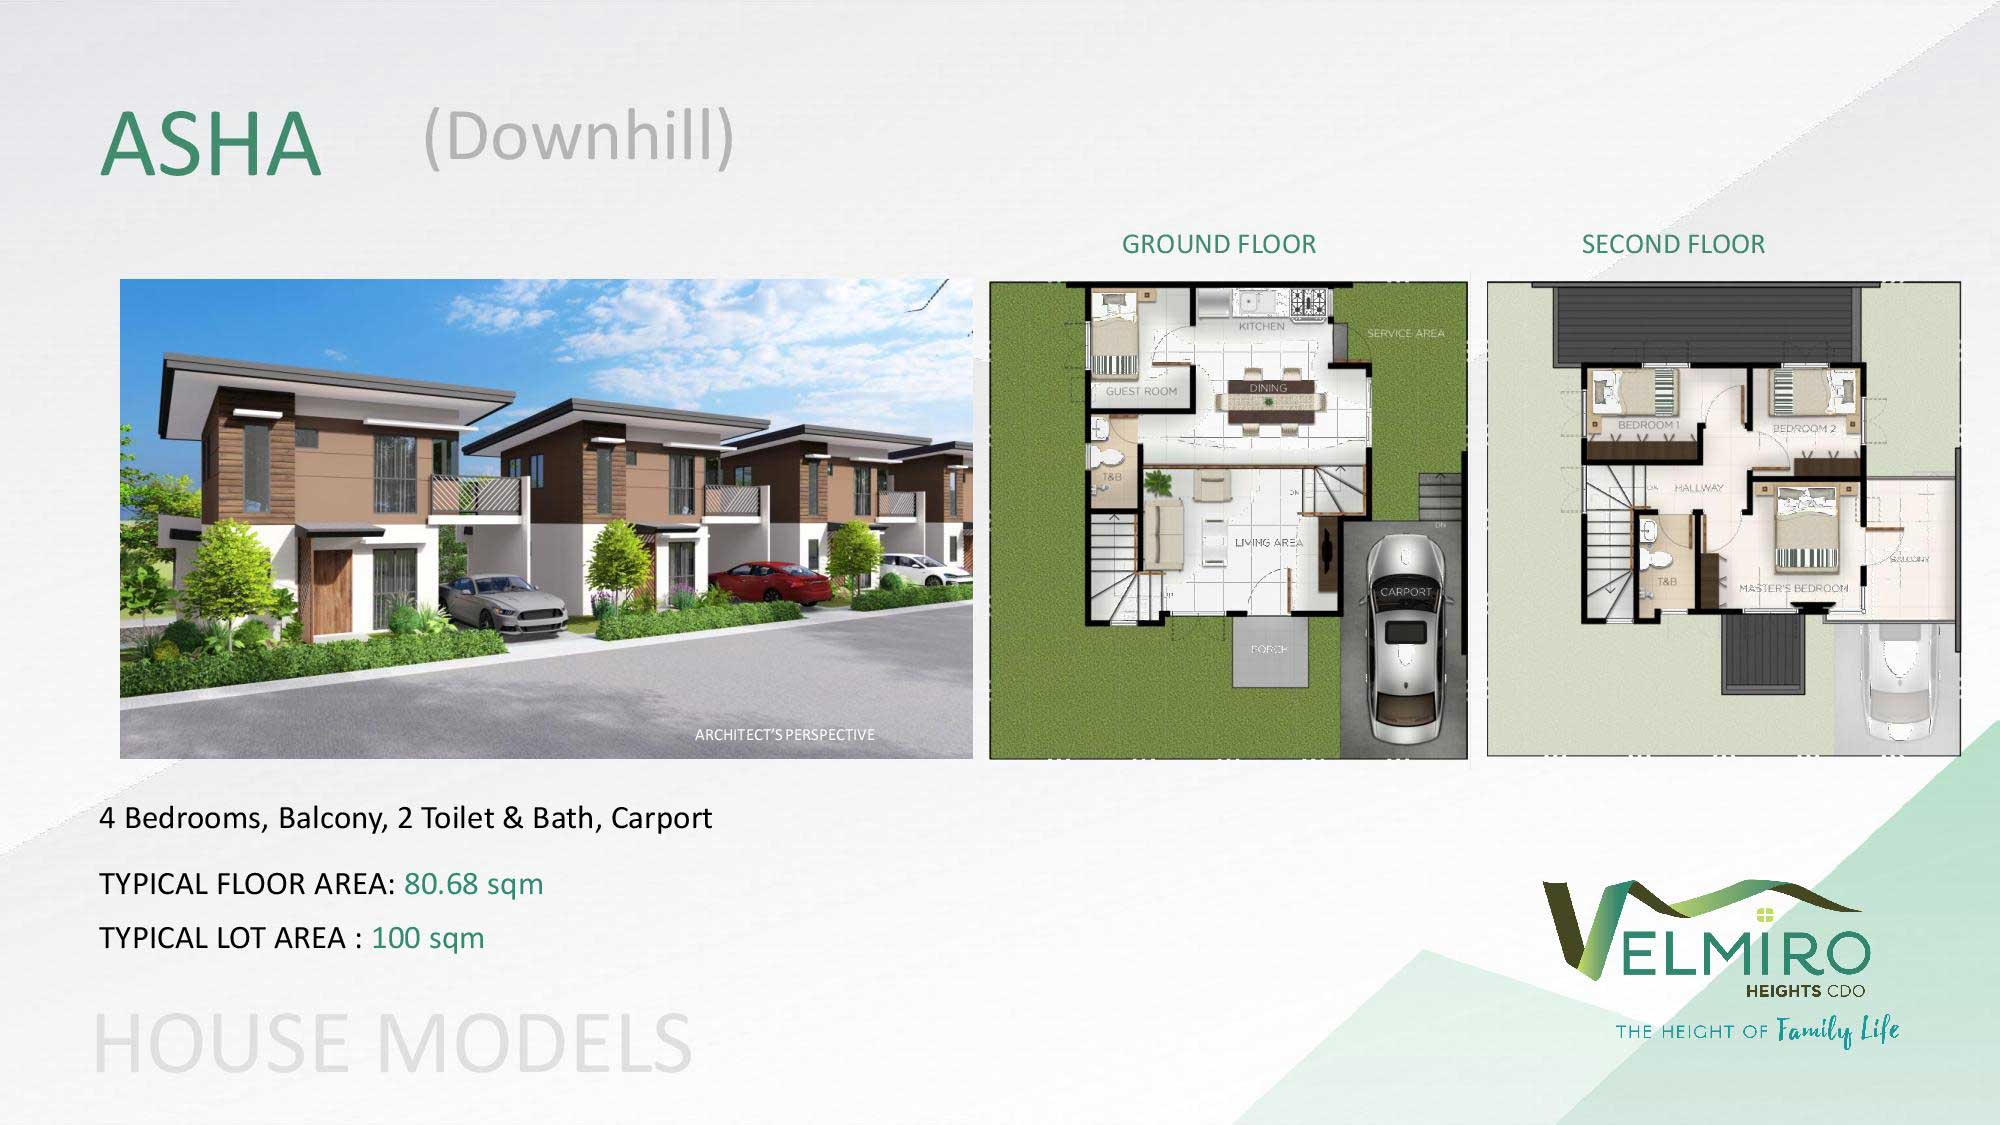 Velmiro heights agusan house model asha downhill web gmc